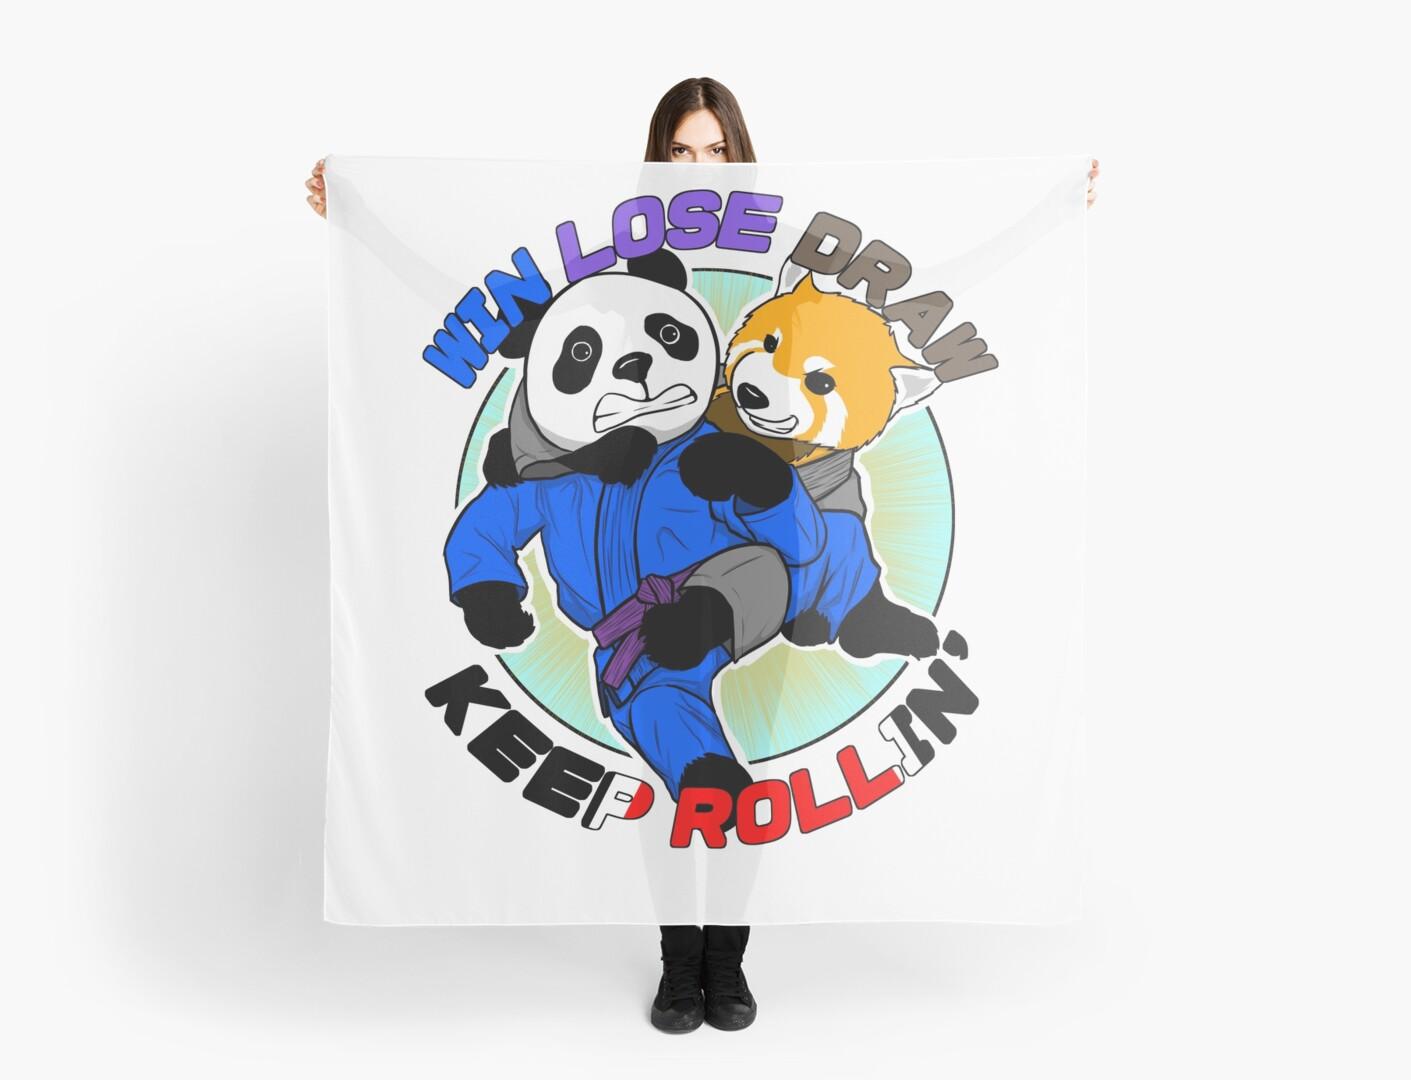 Bjj Jiu Jitsu T Shirt Win Lose Draw Keep Rollin Scarves By Eokako